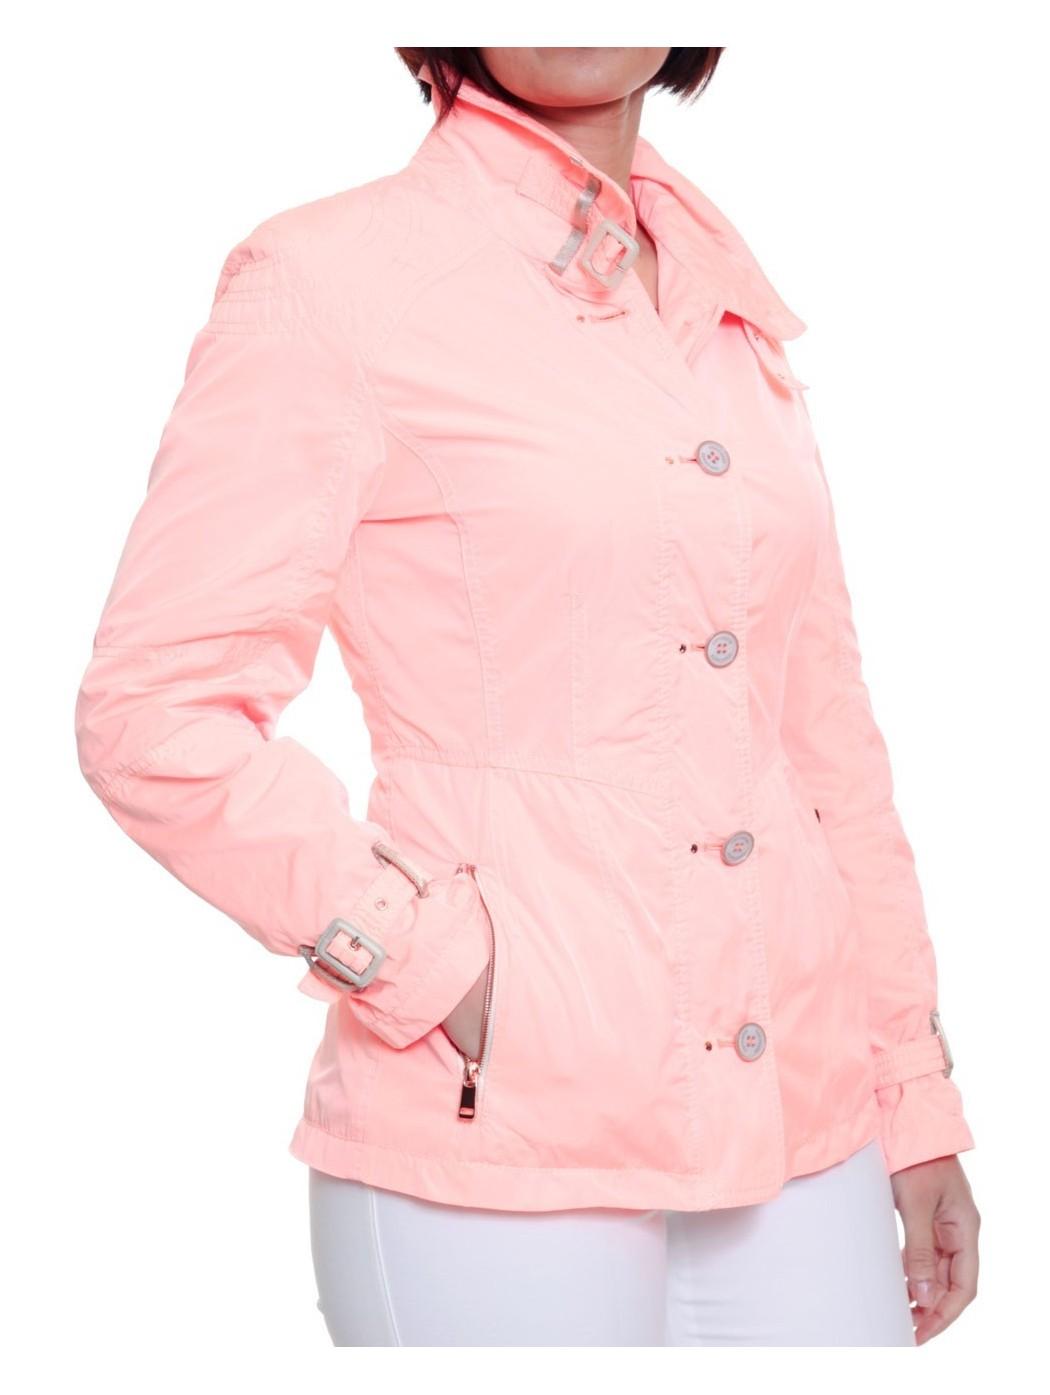 Concept k jacket